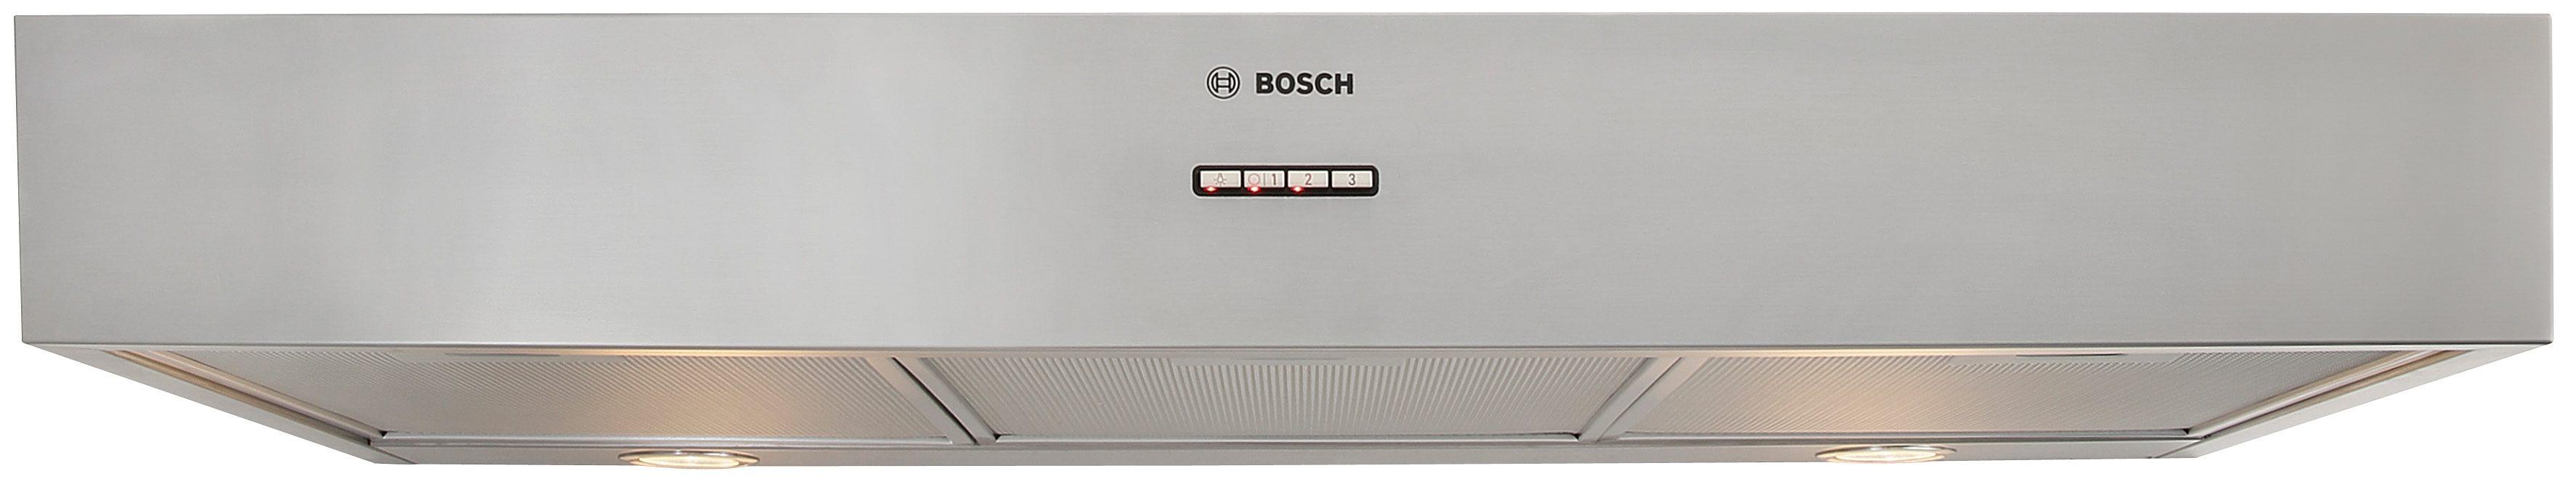 Bosch Unterbauhaube DHU965E